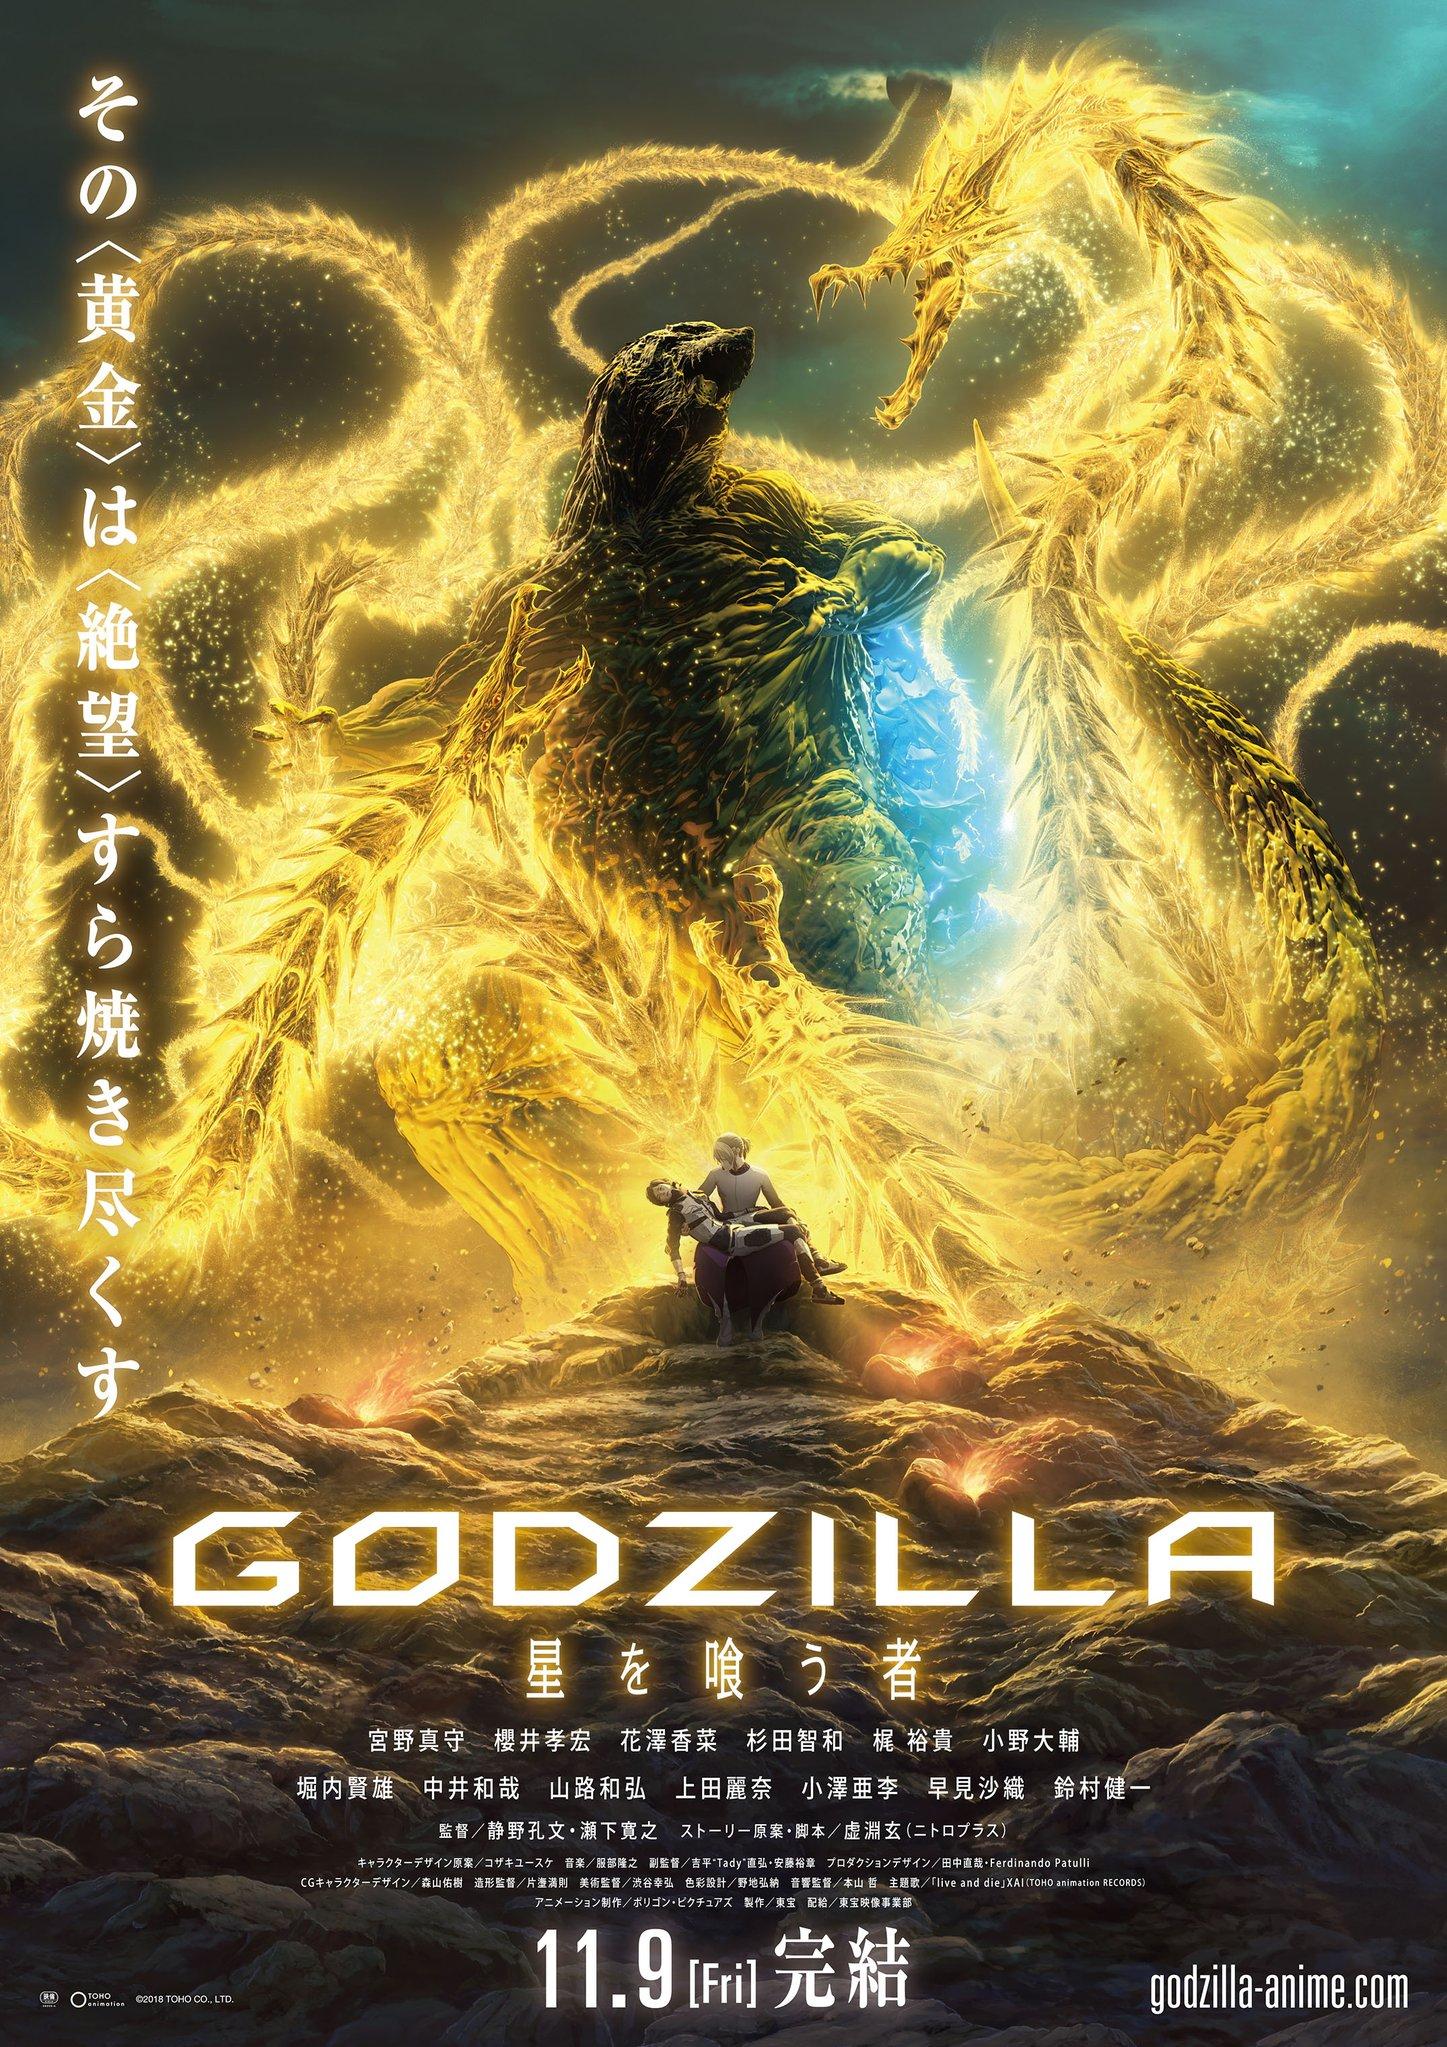 [Netflix] Godzilla - Stareater ซับไทย